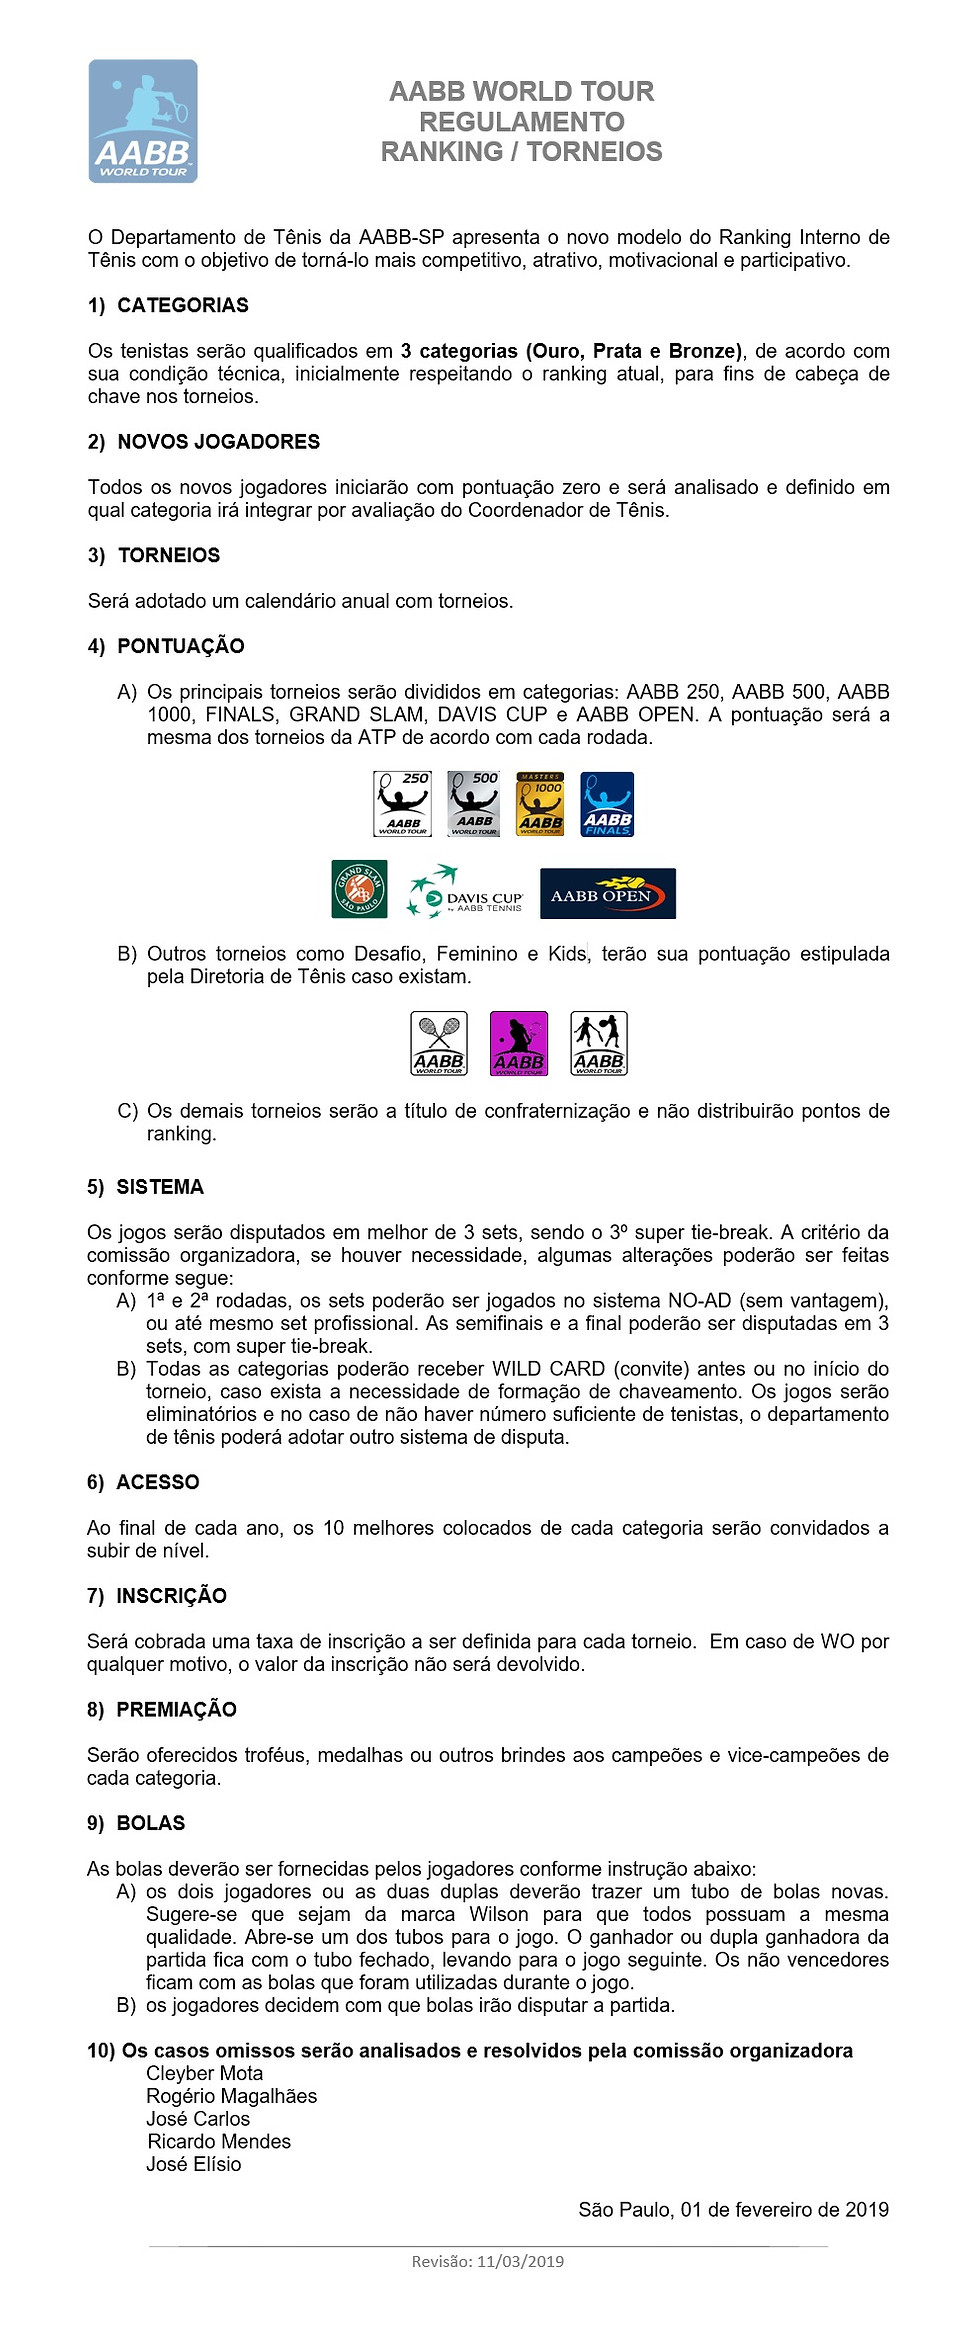 AABB WORLD TOUR - Regulamento - Ranking